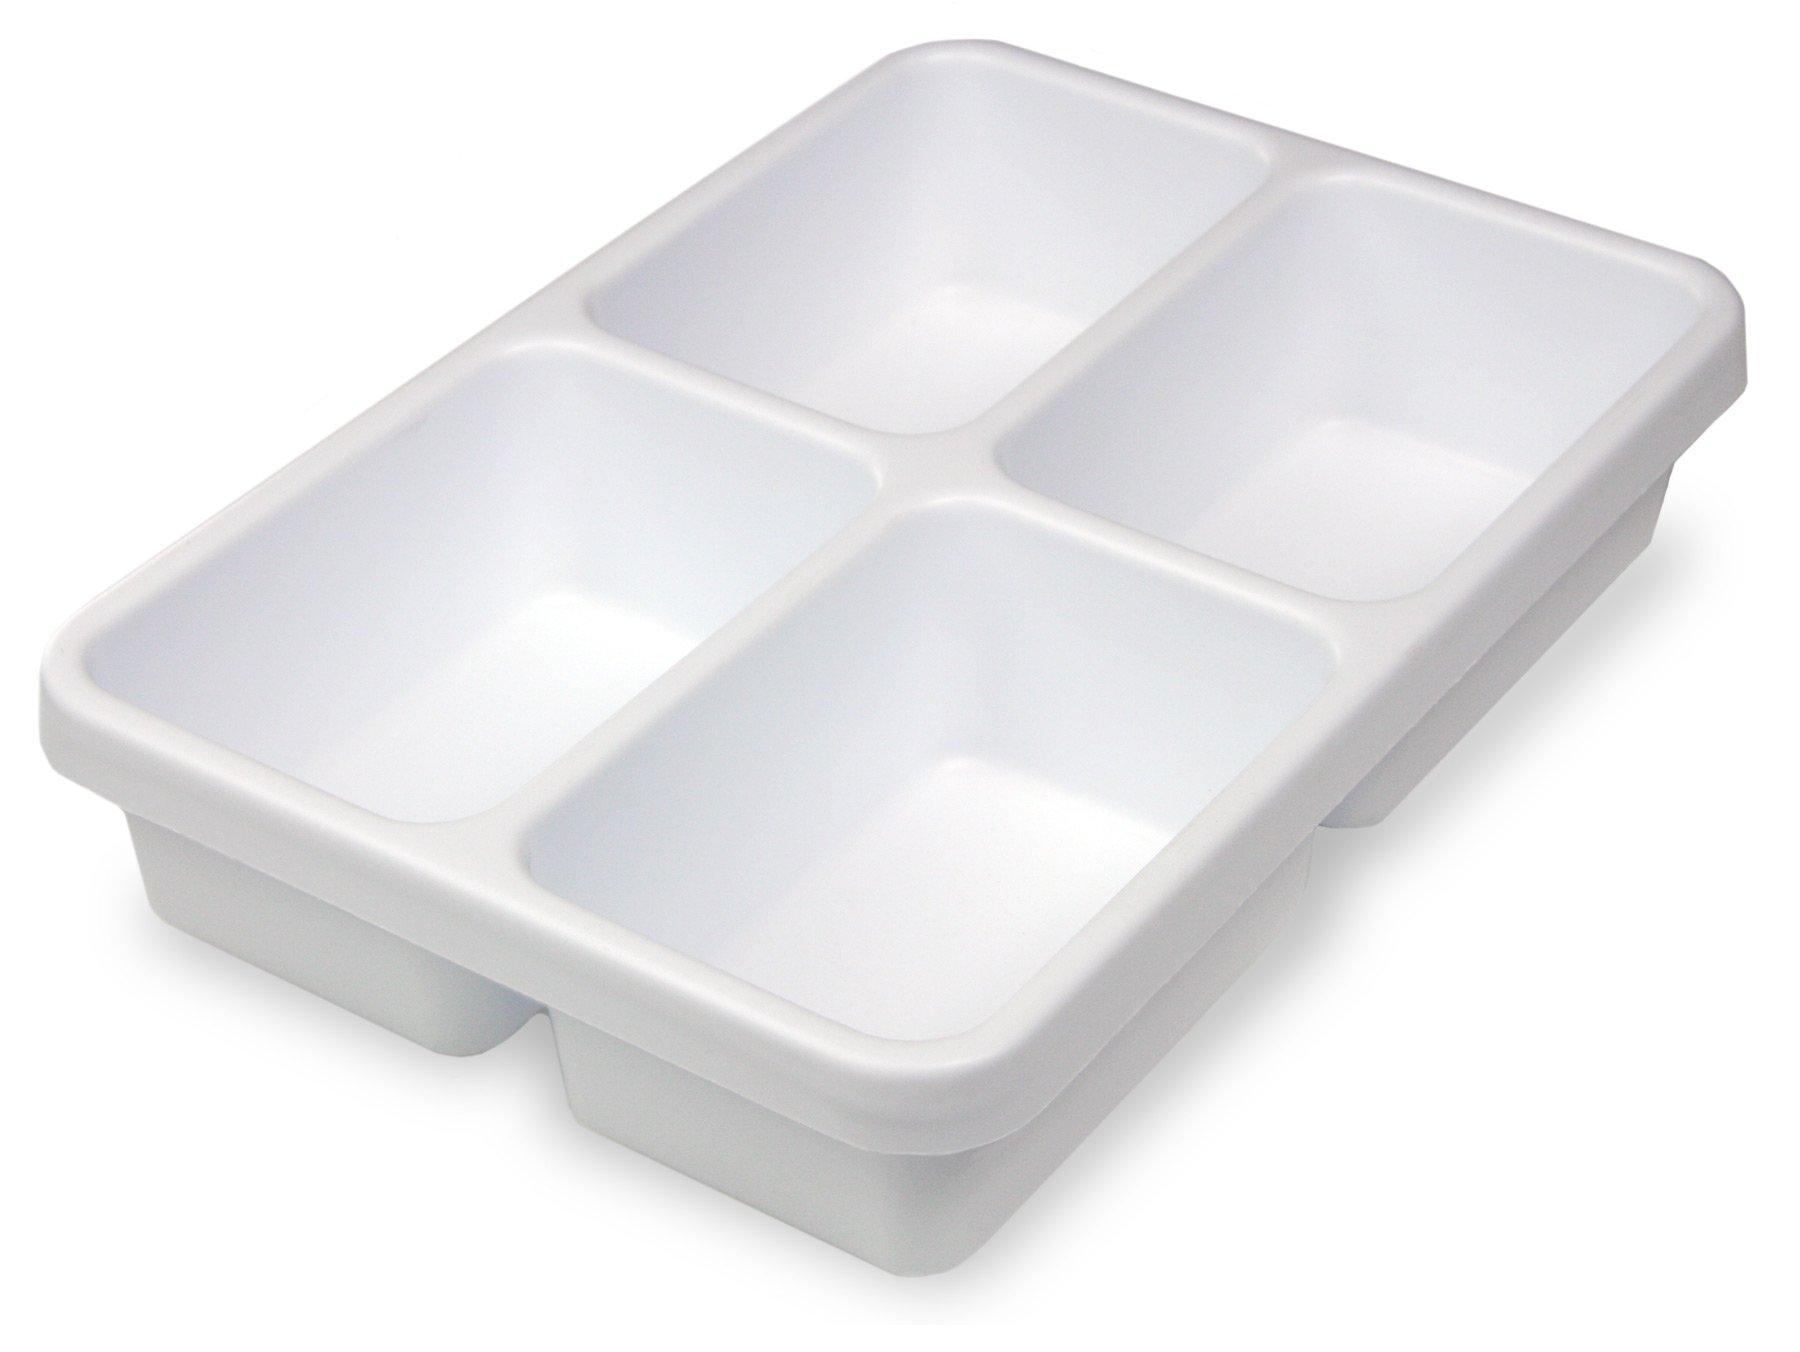 "TrippNT 50180 White Polystyrene Plastic Drawer Organizer, 4 Pocket: 14"" Width x 3"" Height x 10"" Depth"